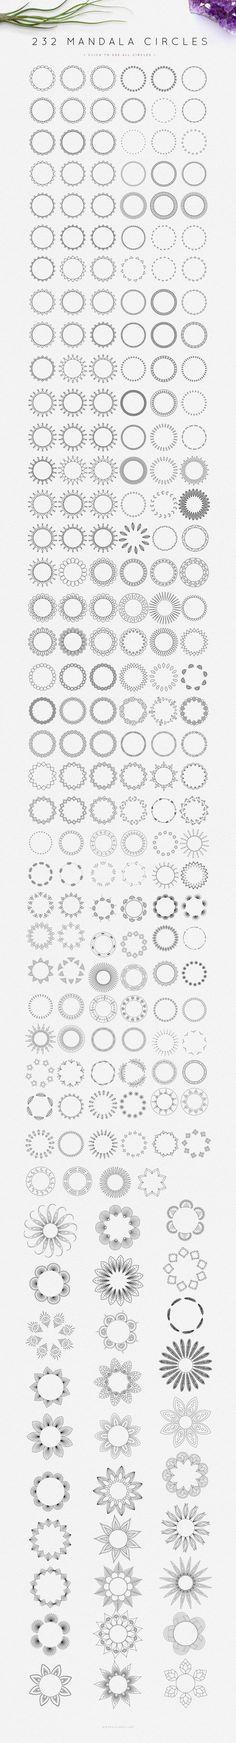 Mandala Logo Creator ♦ INTRO:30% OFF by Mindful Pixels on Creative Market